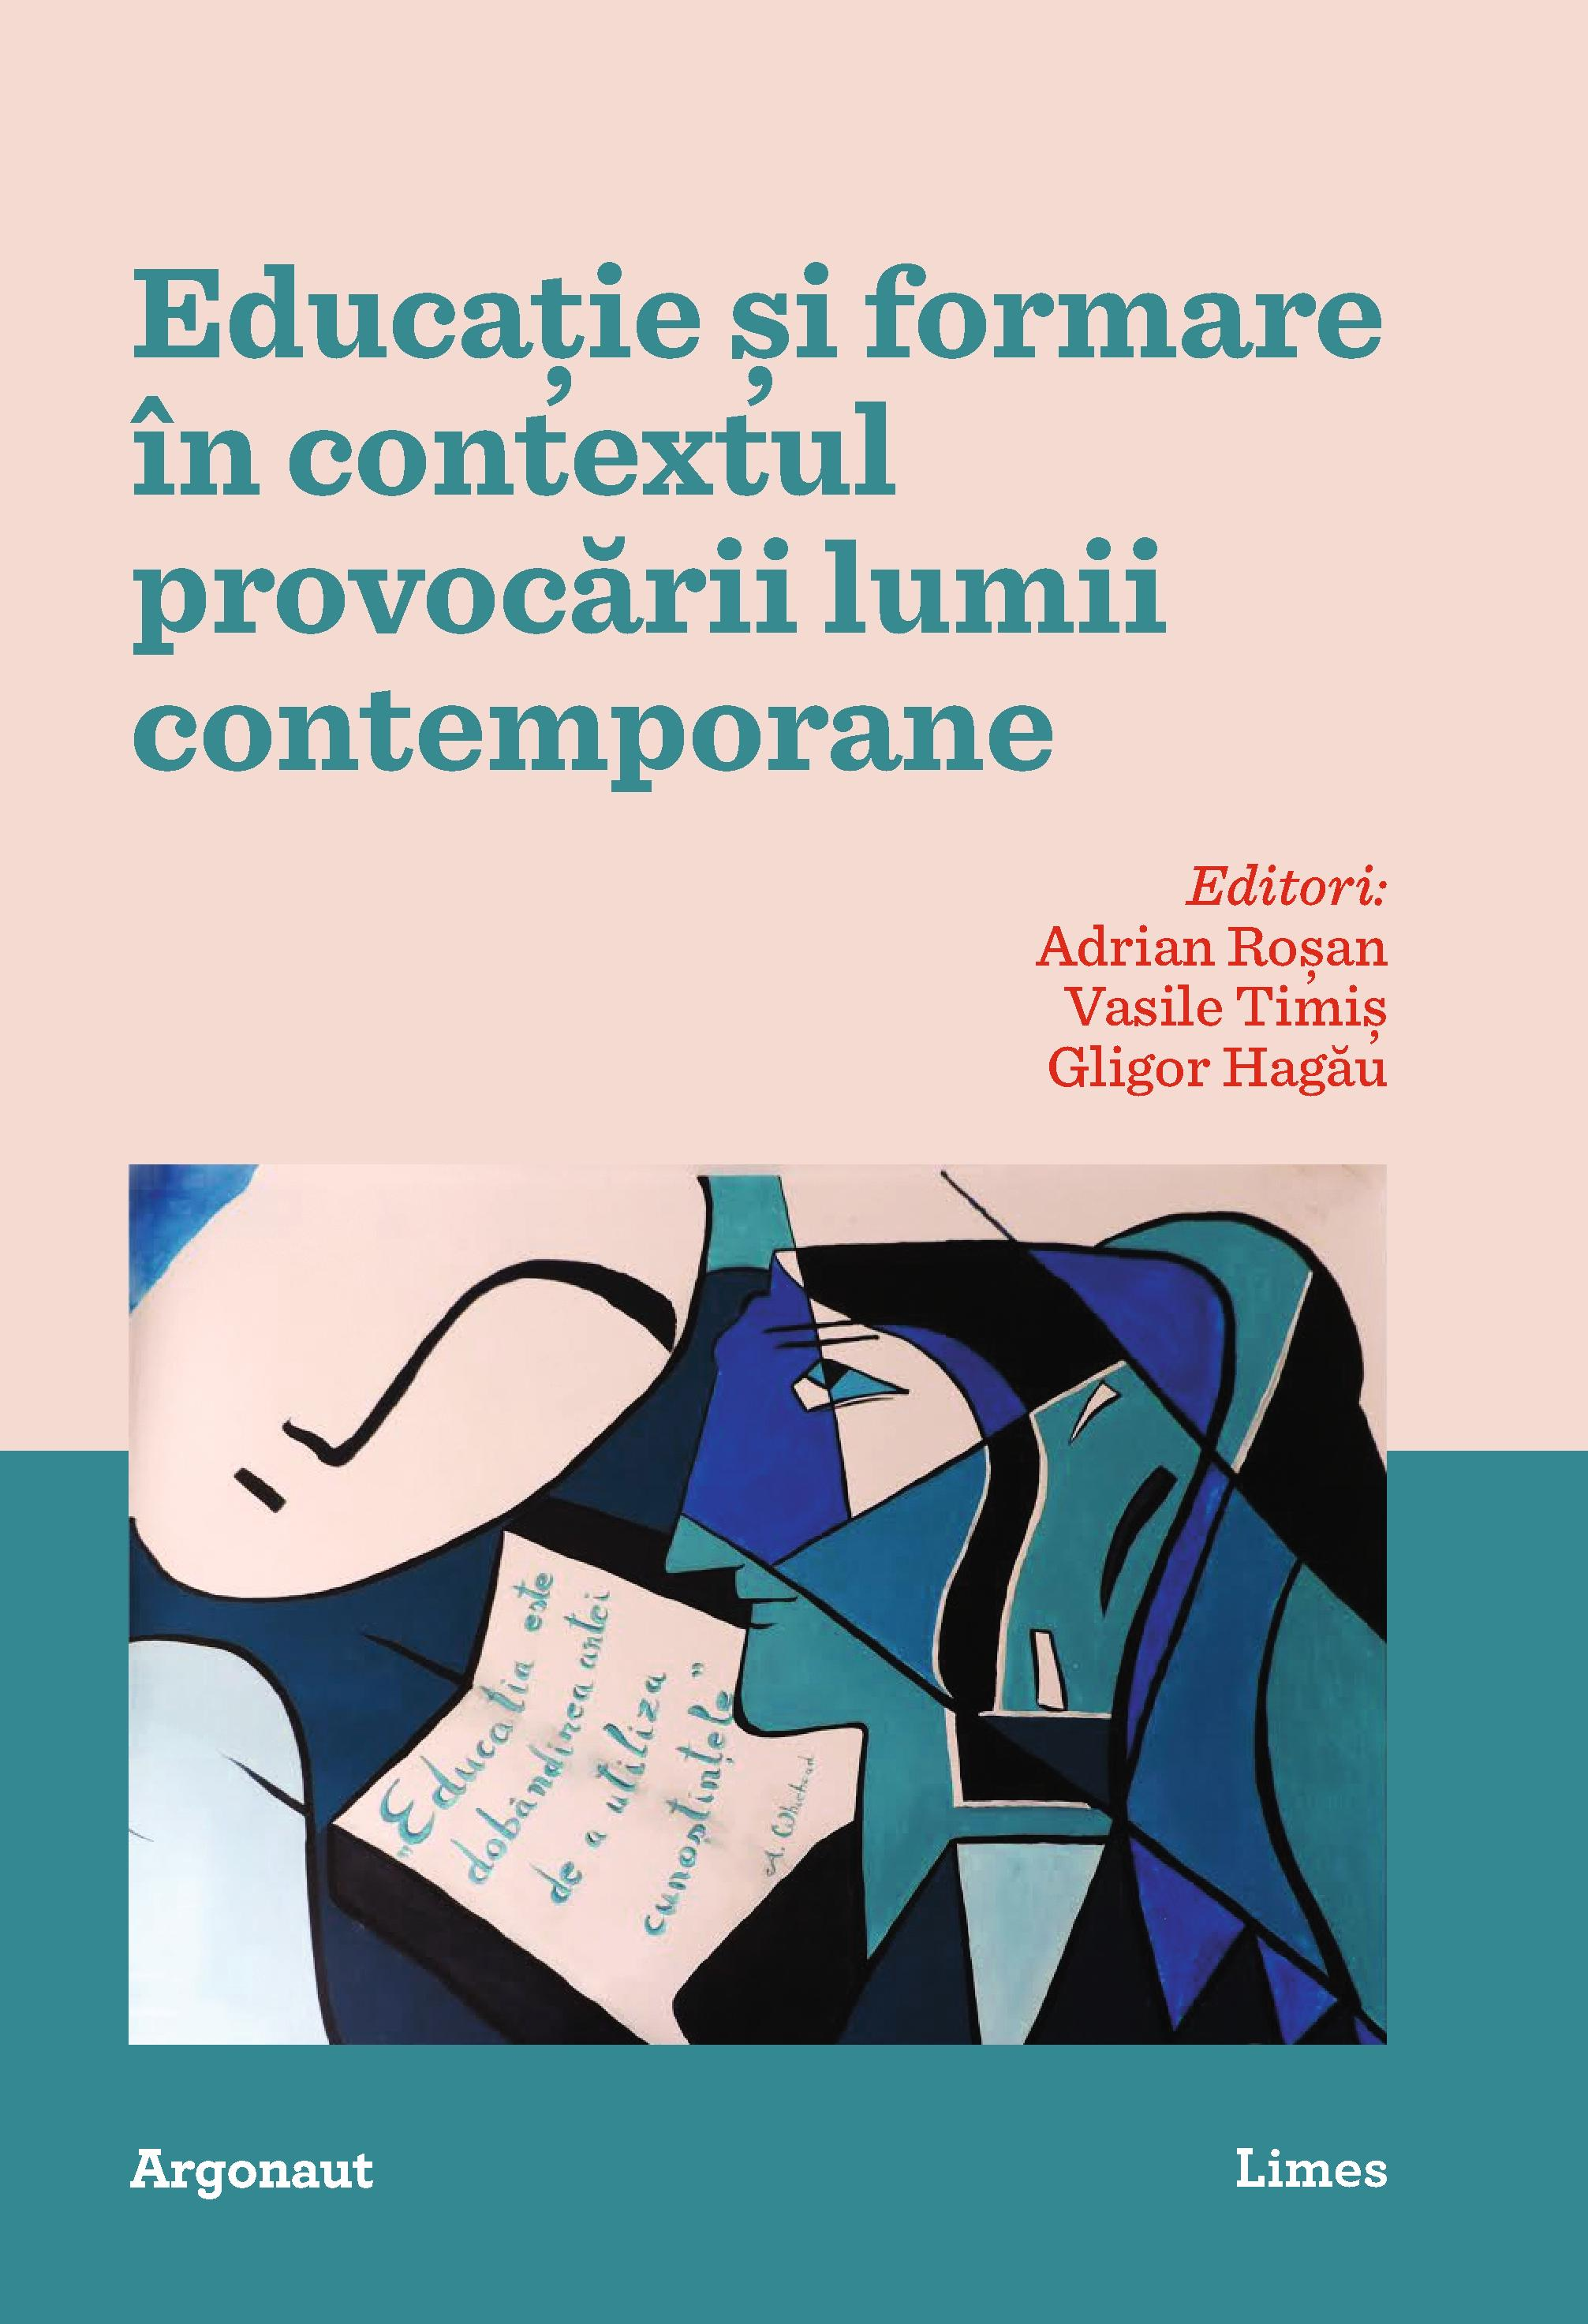 coperta volum - Educatie si formare in contextul provocarilor lumii contemporane